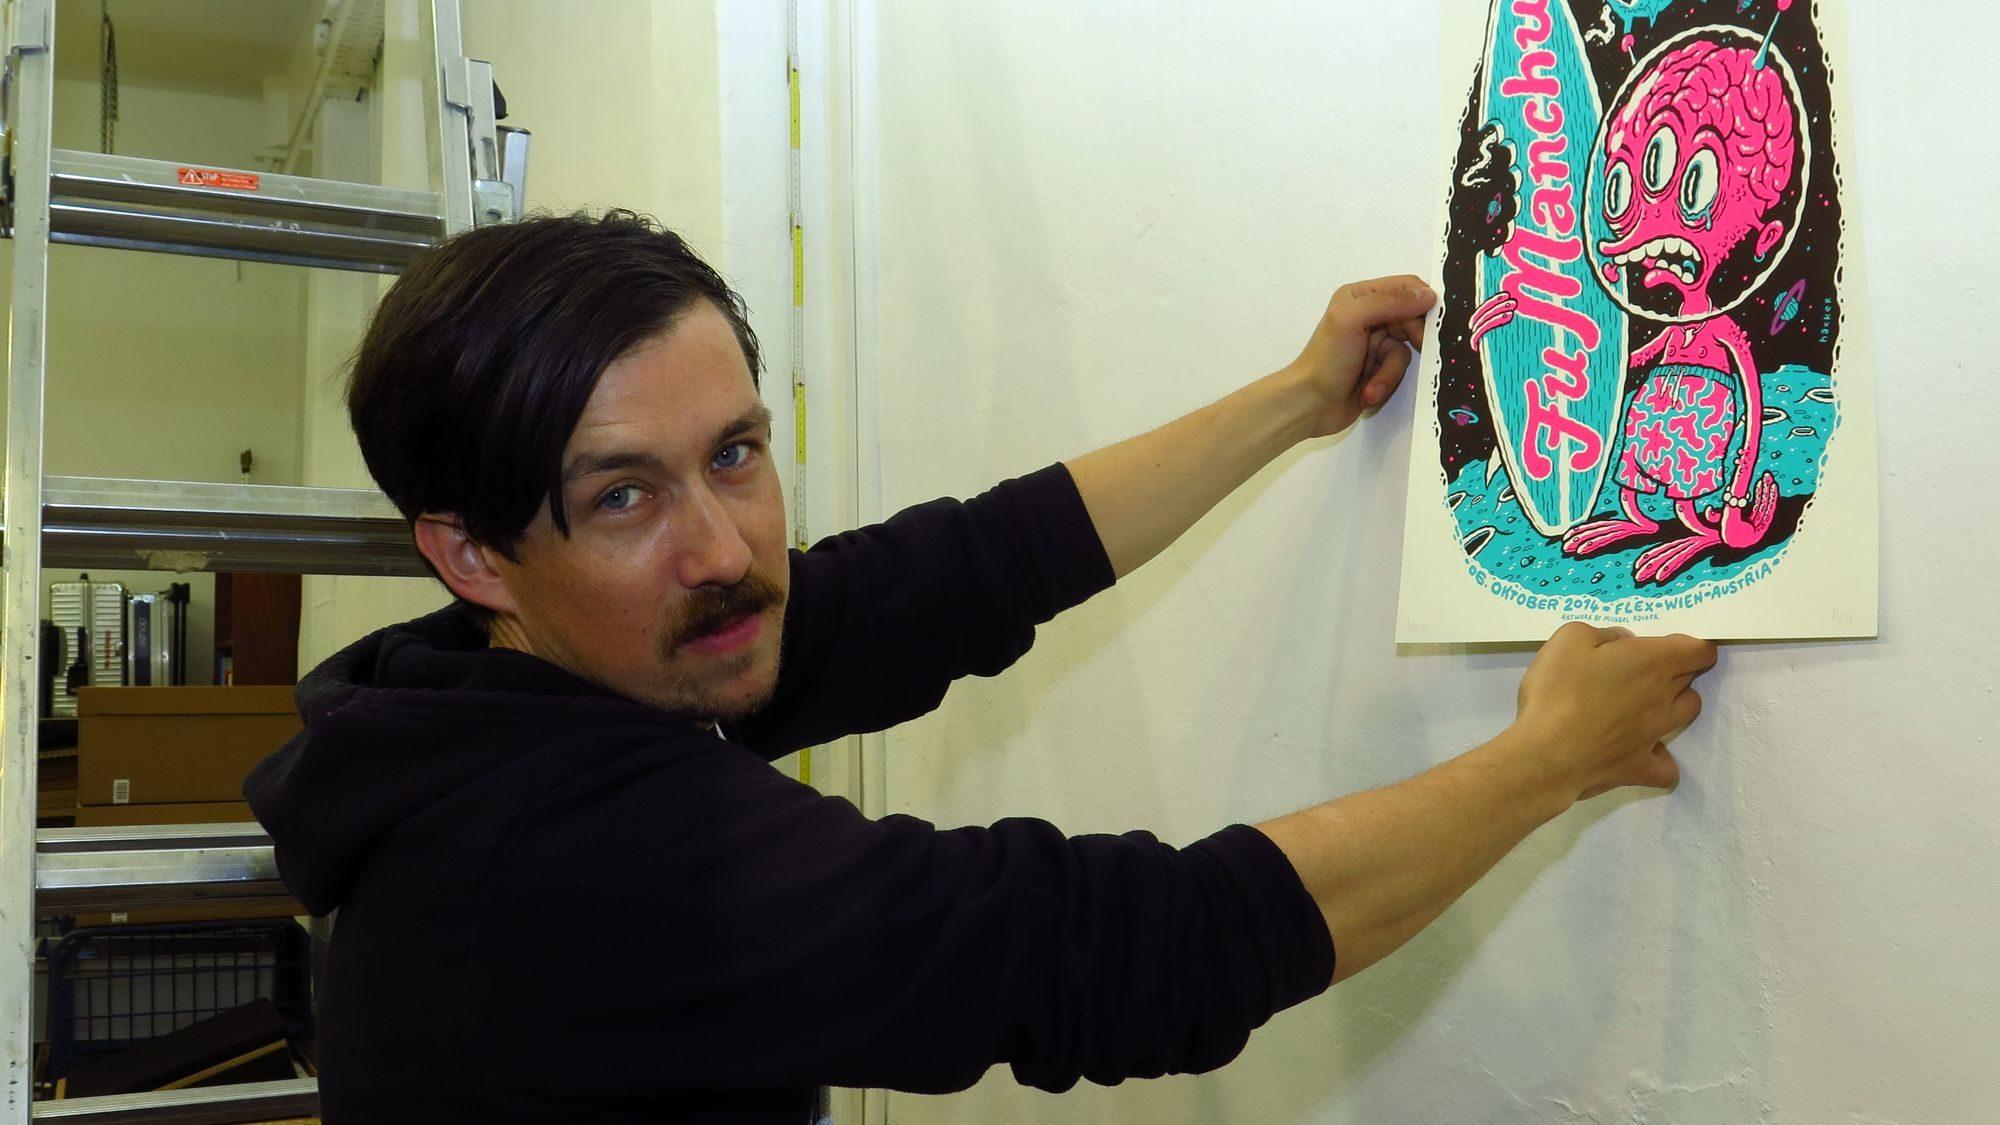 Mini Colored Gigs: Gig-Poster-Künstler Michael Hacker